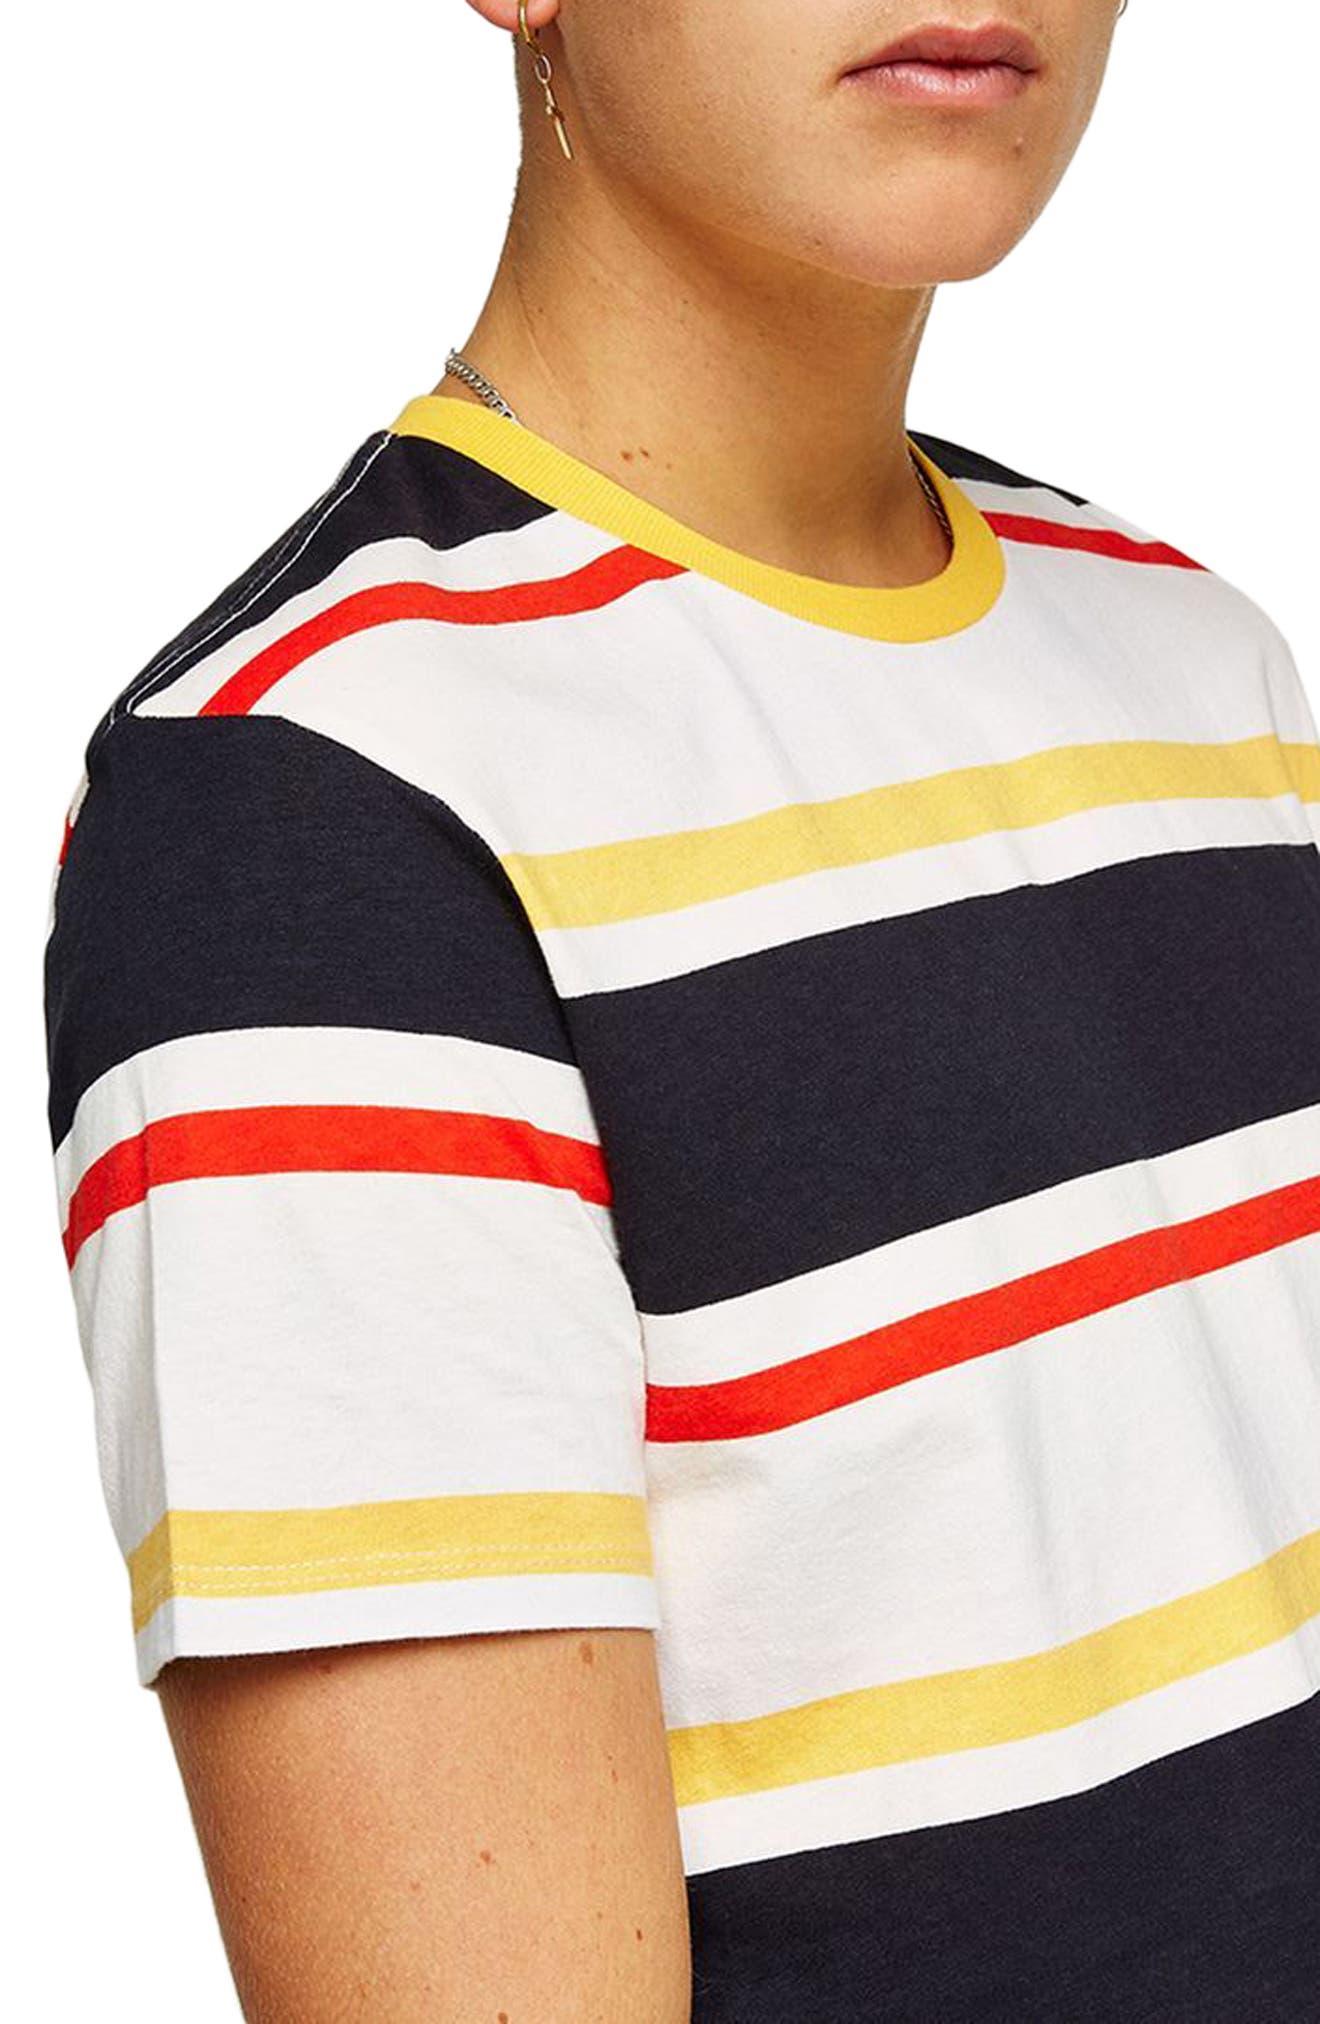 Slim Fit Stripe T-Shirt,                             Alternate thumbnail 3, color,                             Yellow Multi